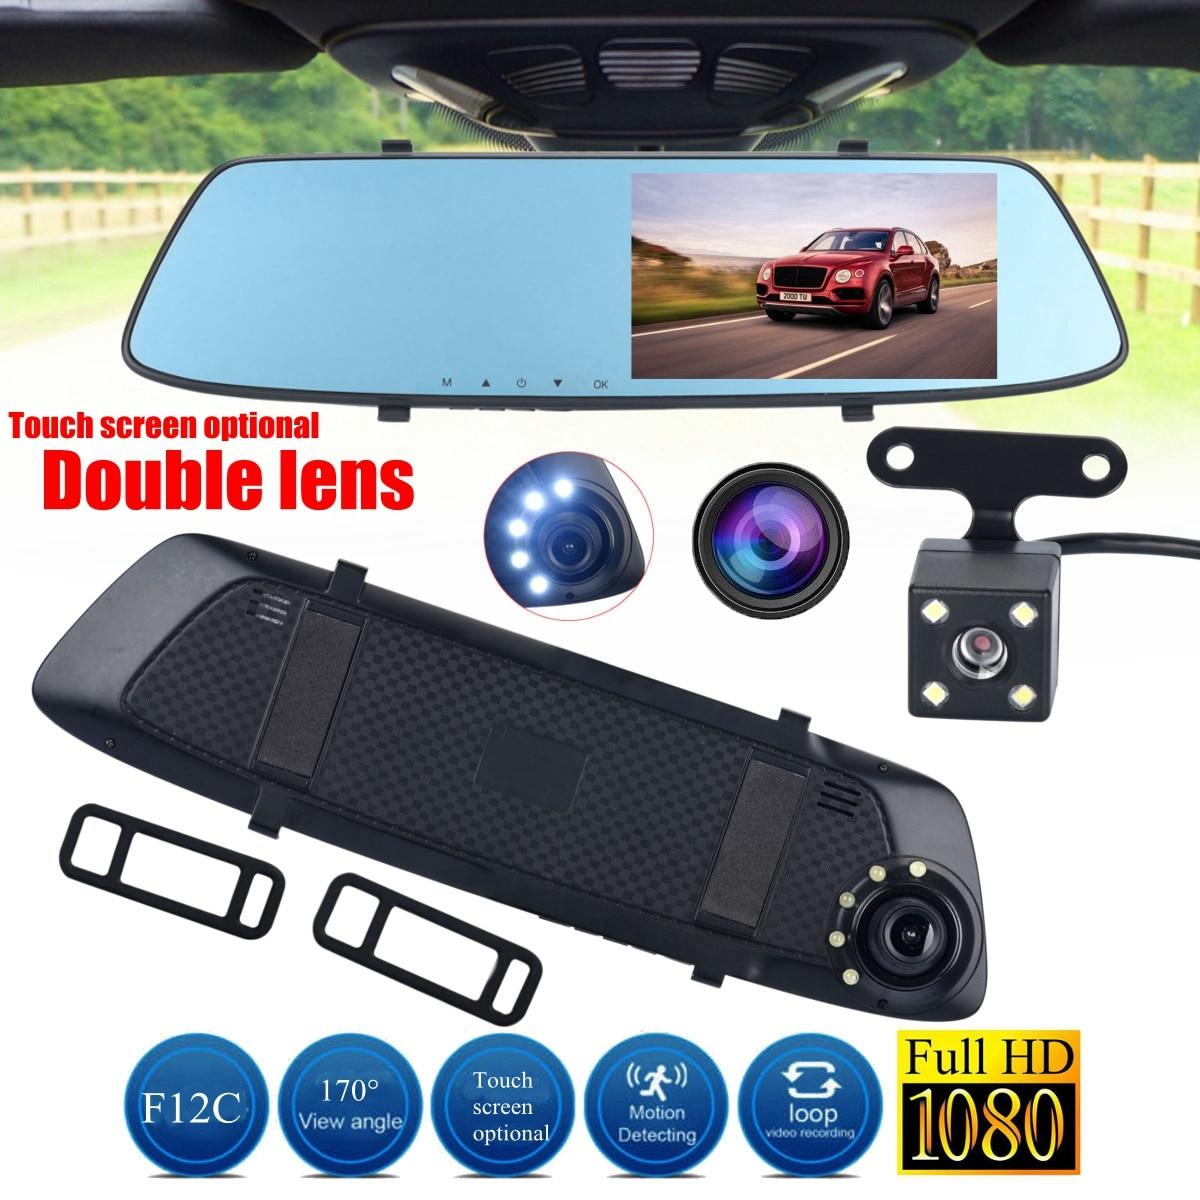 HD 1080P Dual Lens Rearview Mirror Camera Recorder Car DVR Dash Cam 4.3 Inch Vehicle Night Vision